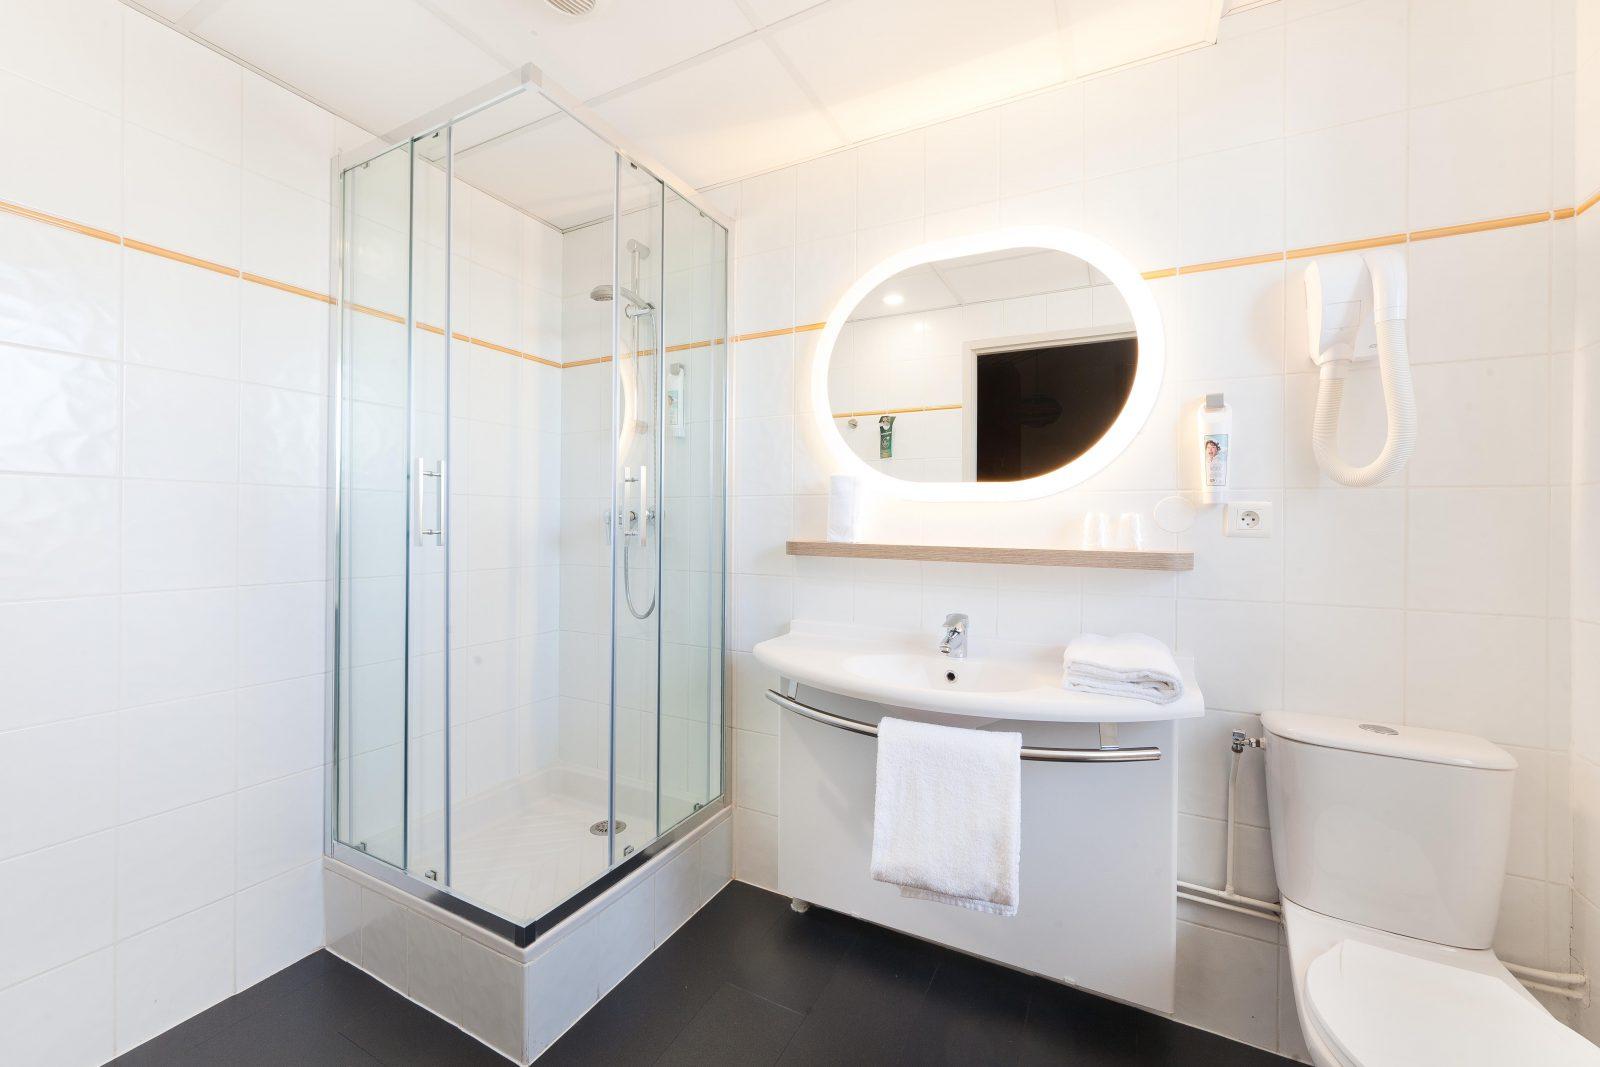 Hôtel Ibis Styles – Lavaur